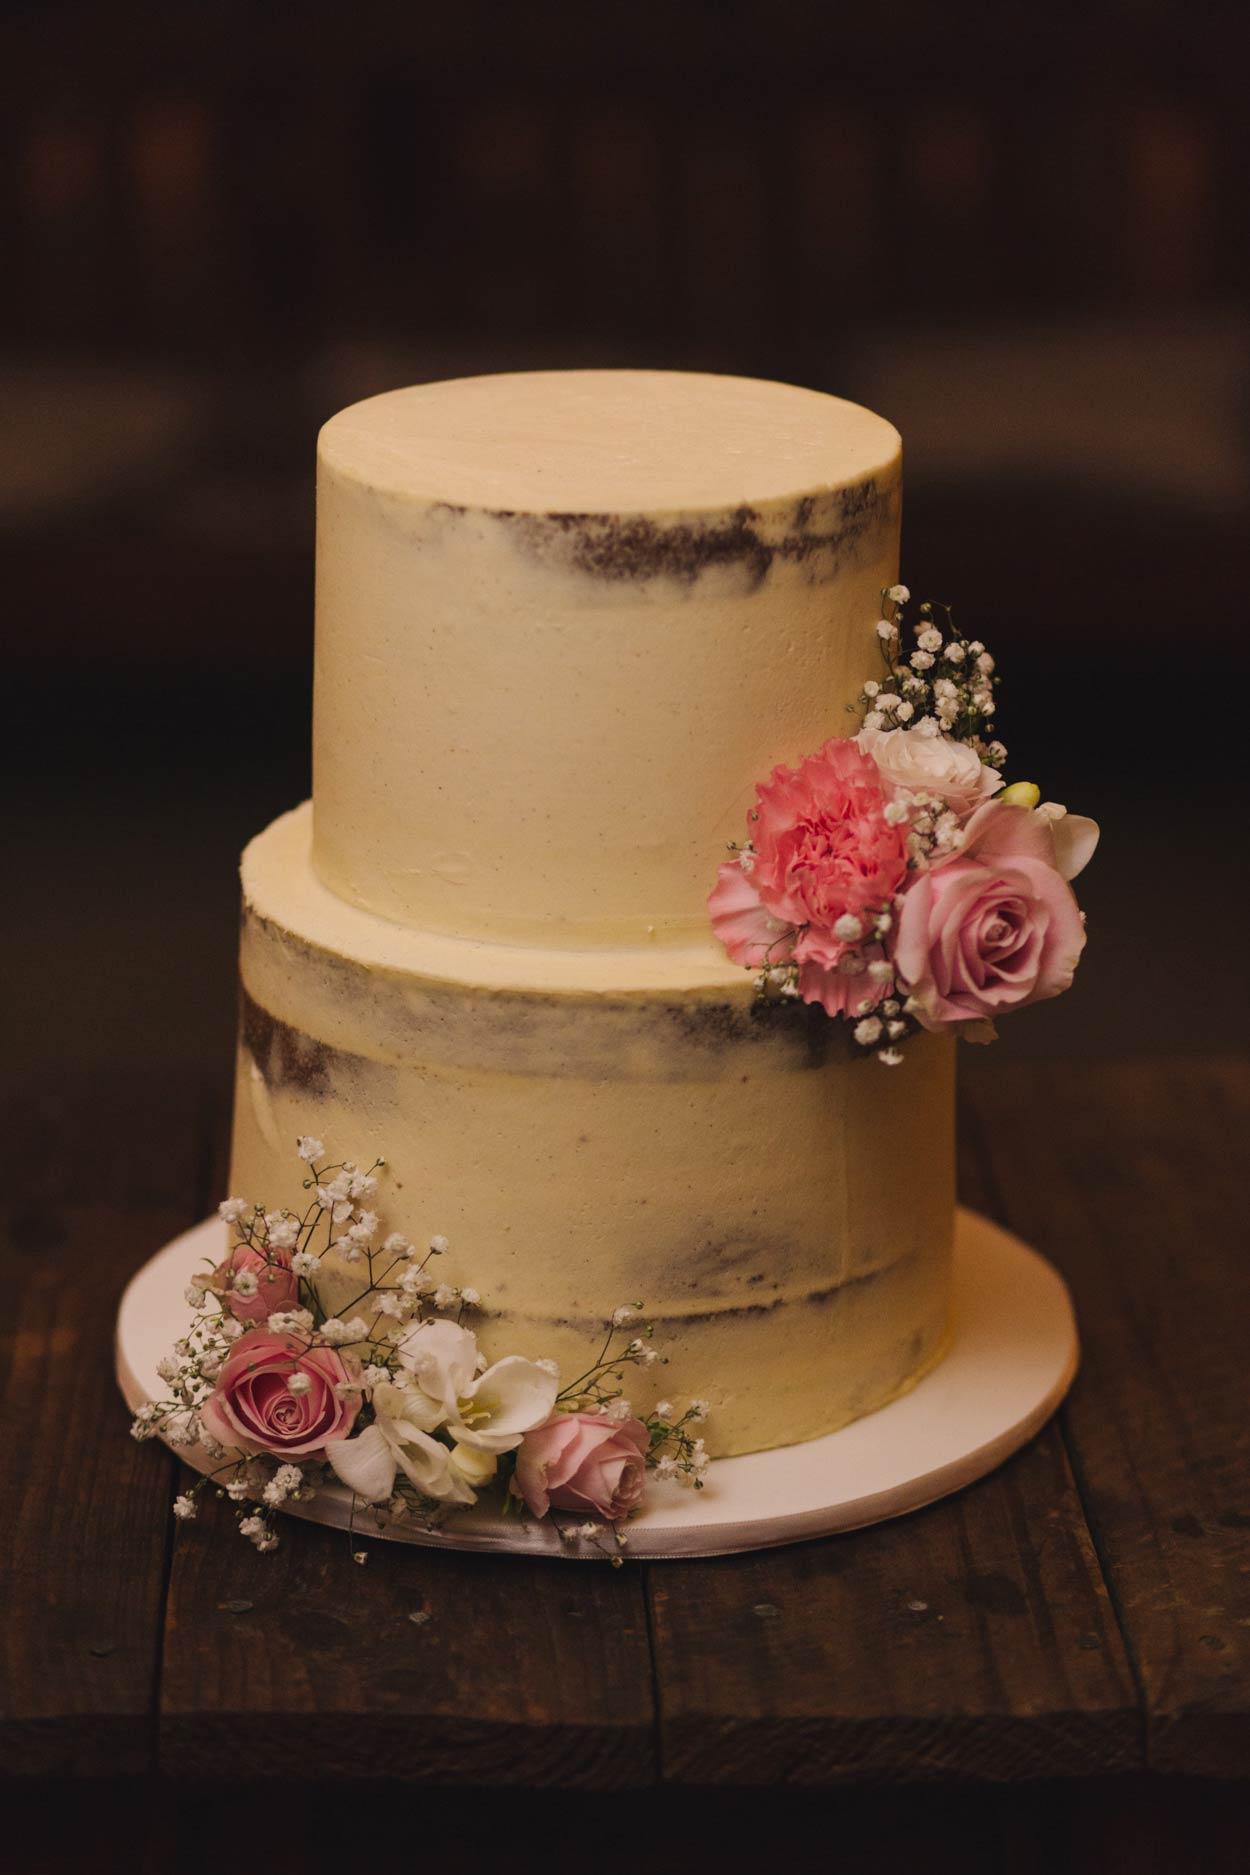 Yandina Station Wedding Cake, Maleny - Brisbane, Byron Bay, Australian Pre Wedding Photographers